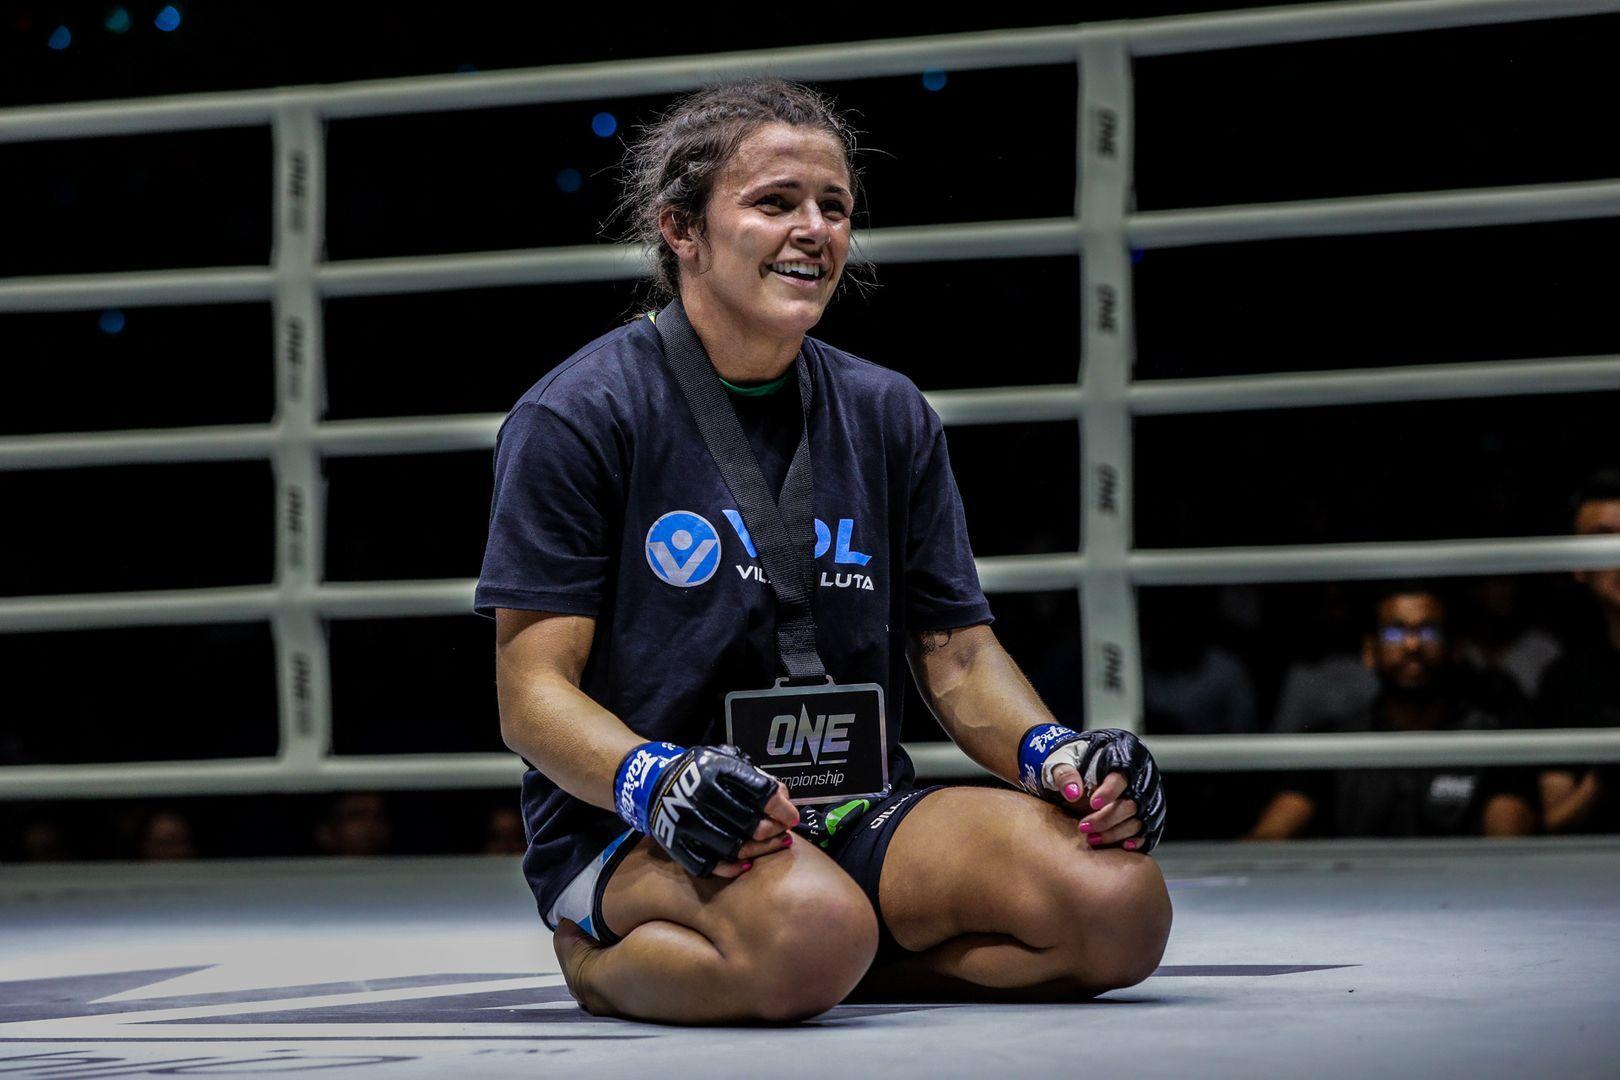 Eight-time Brazilian Jiu-Jitsu World Champion Michelle Nicolini wears the winner's medal following her win